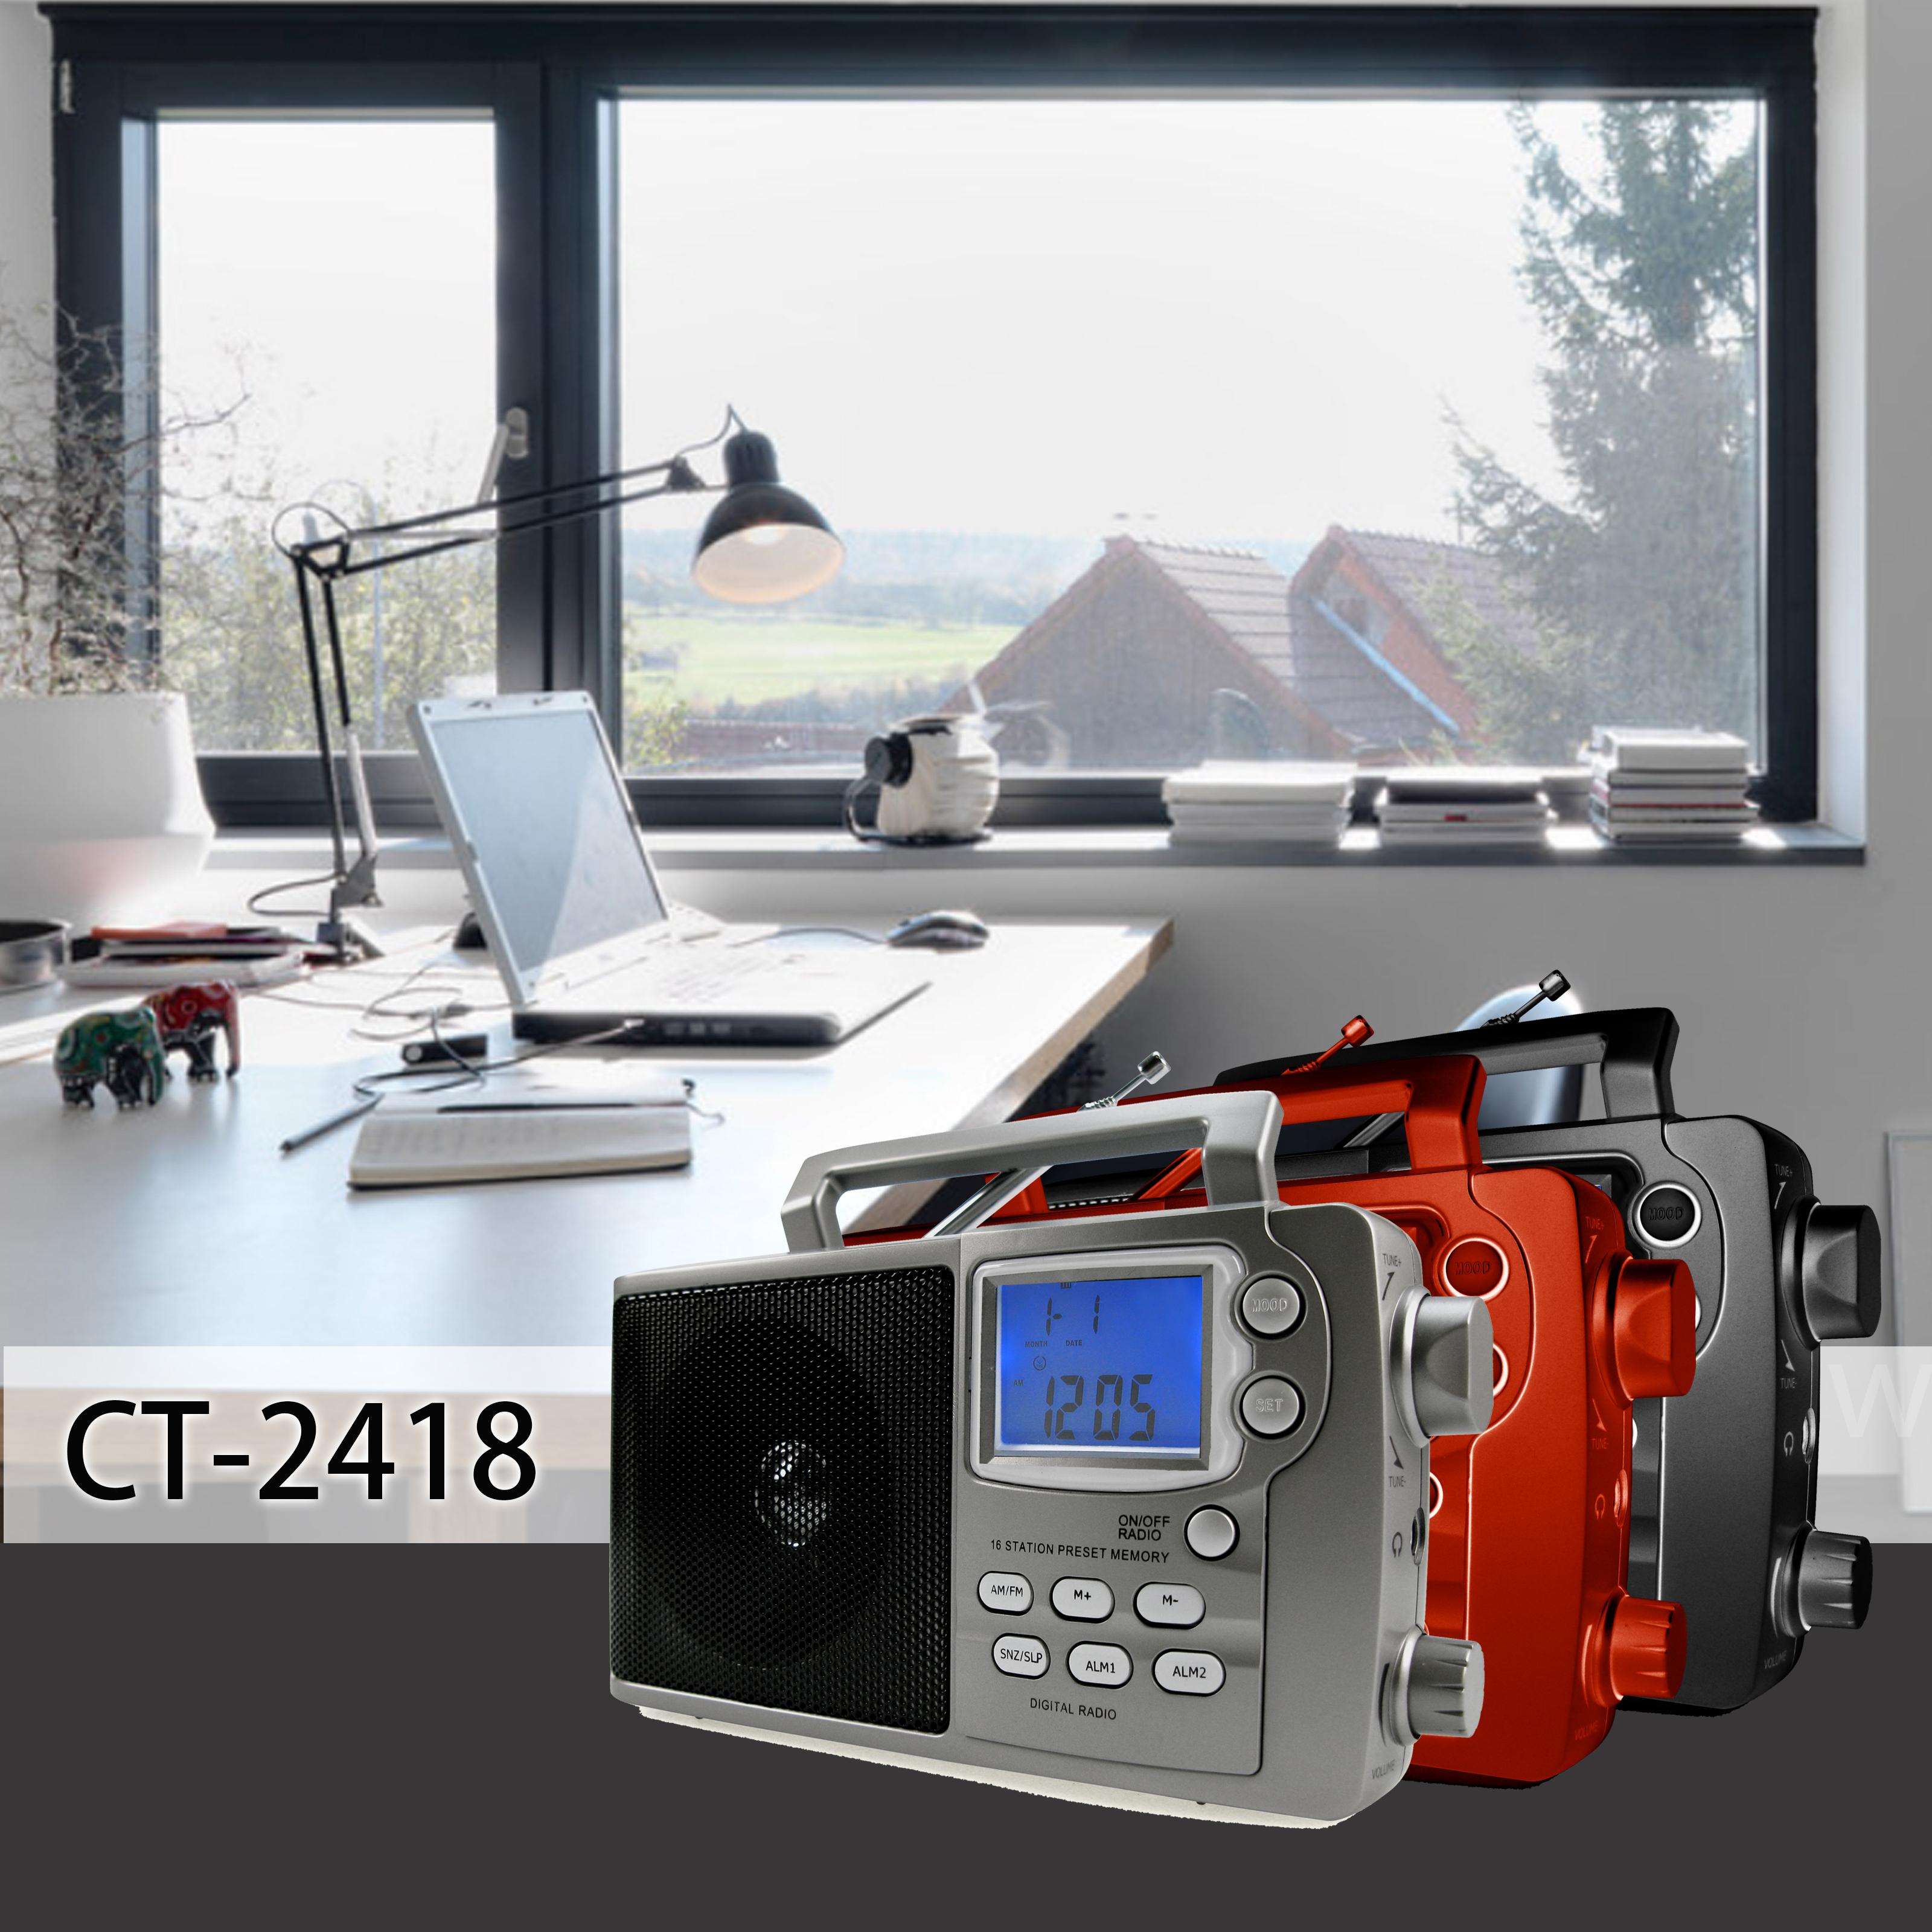 CT-2418 working room.jpg